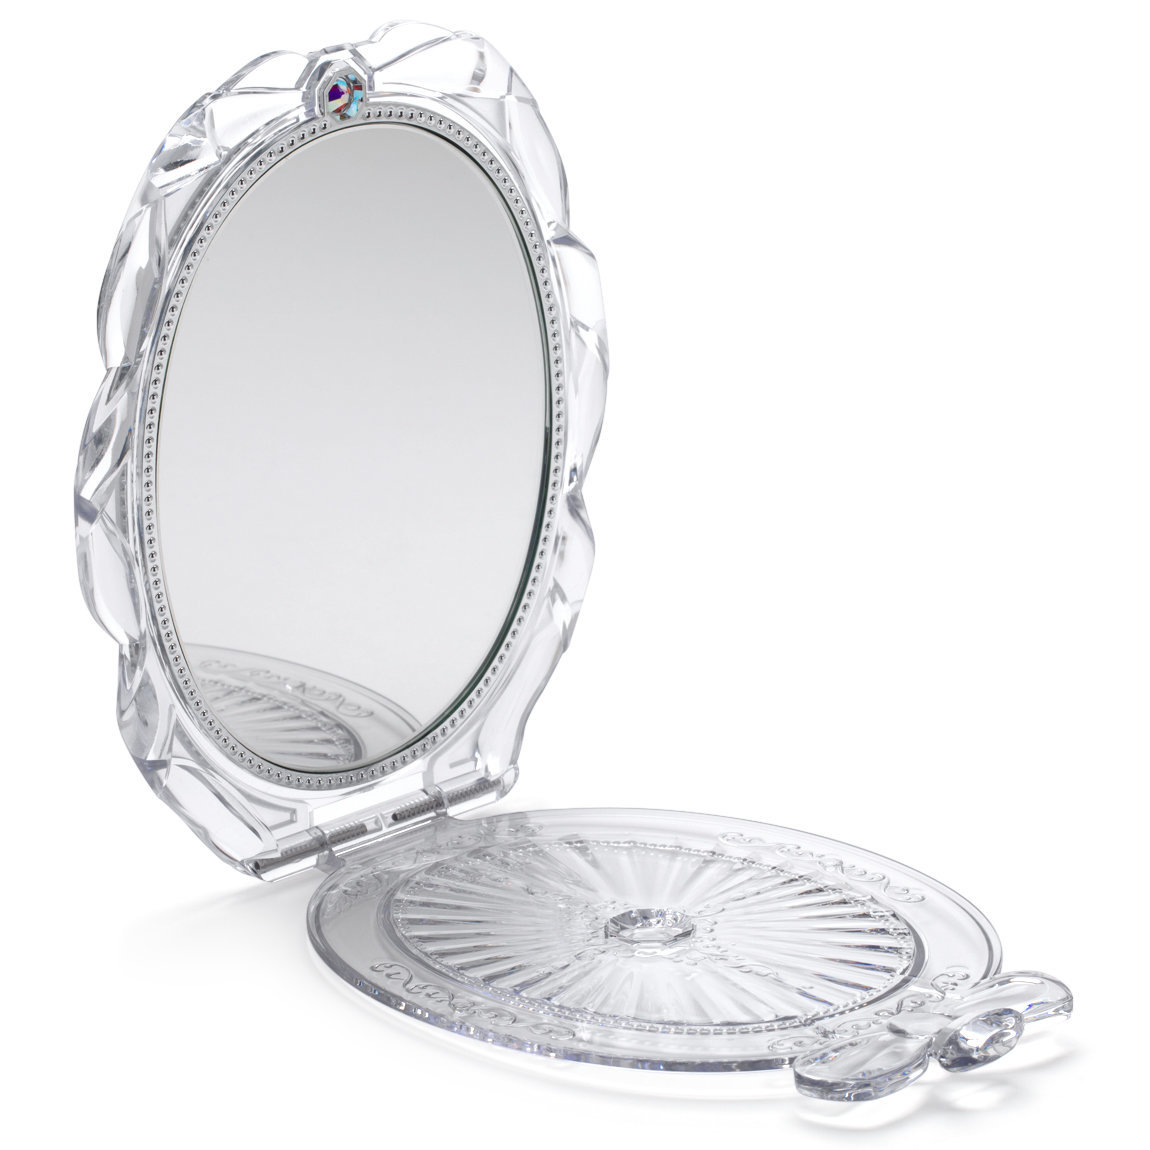 JILL STUART Beauty Compact Mirror II product swatch.